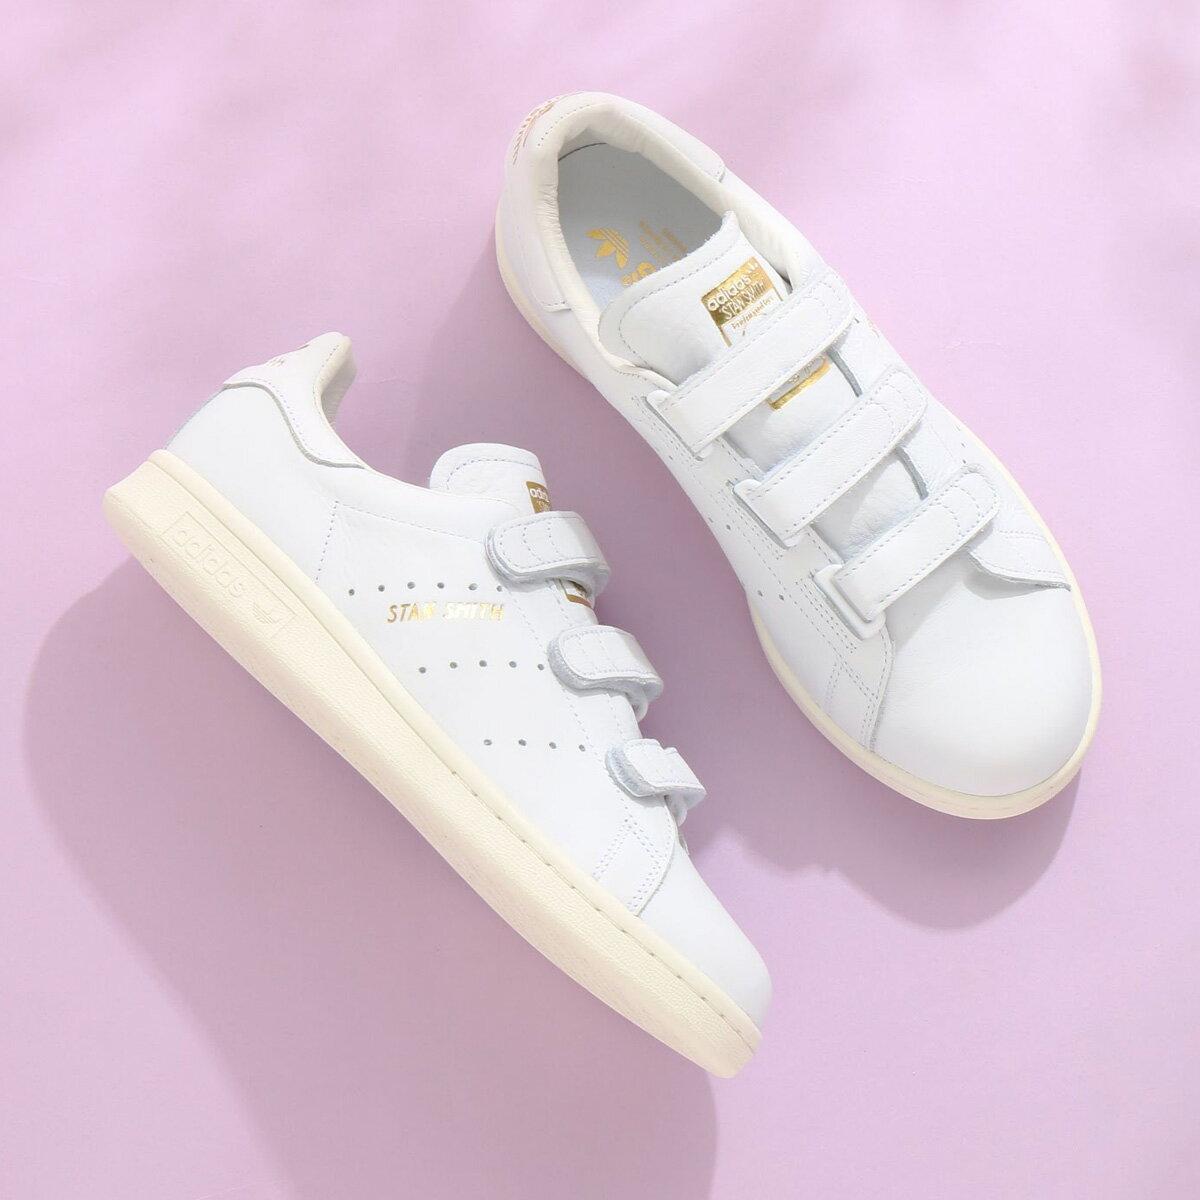 adidas Originals STAN SMITH CF(アディダス オリジナルス スタンスミス CF)Running White/Running White/Gold Met18SS-I